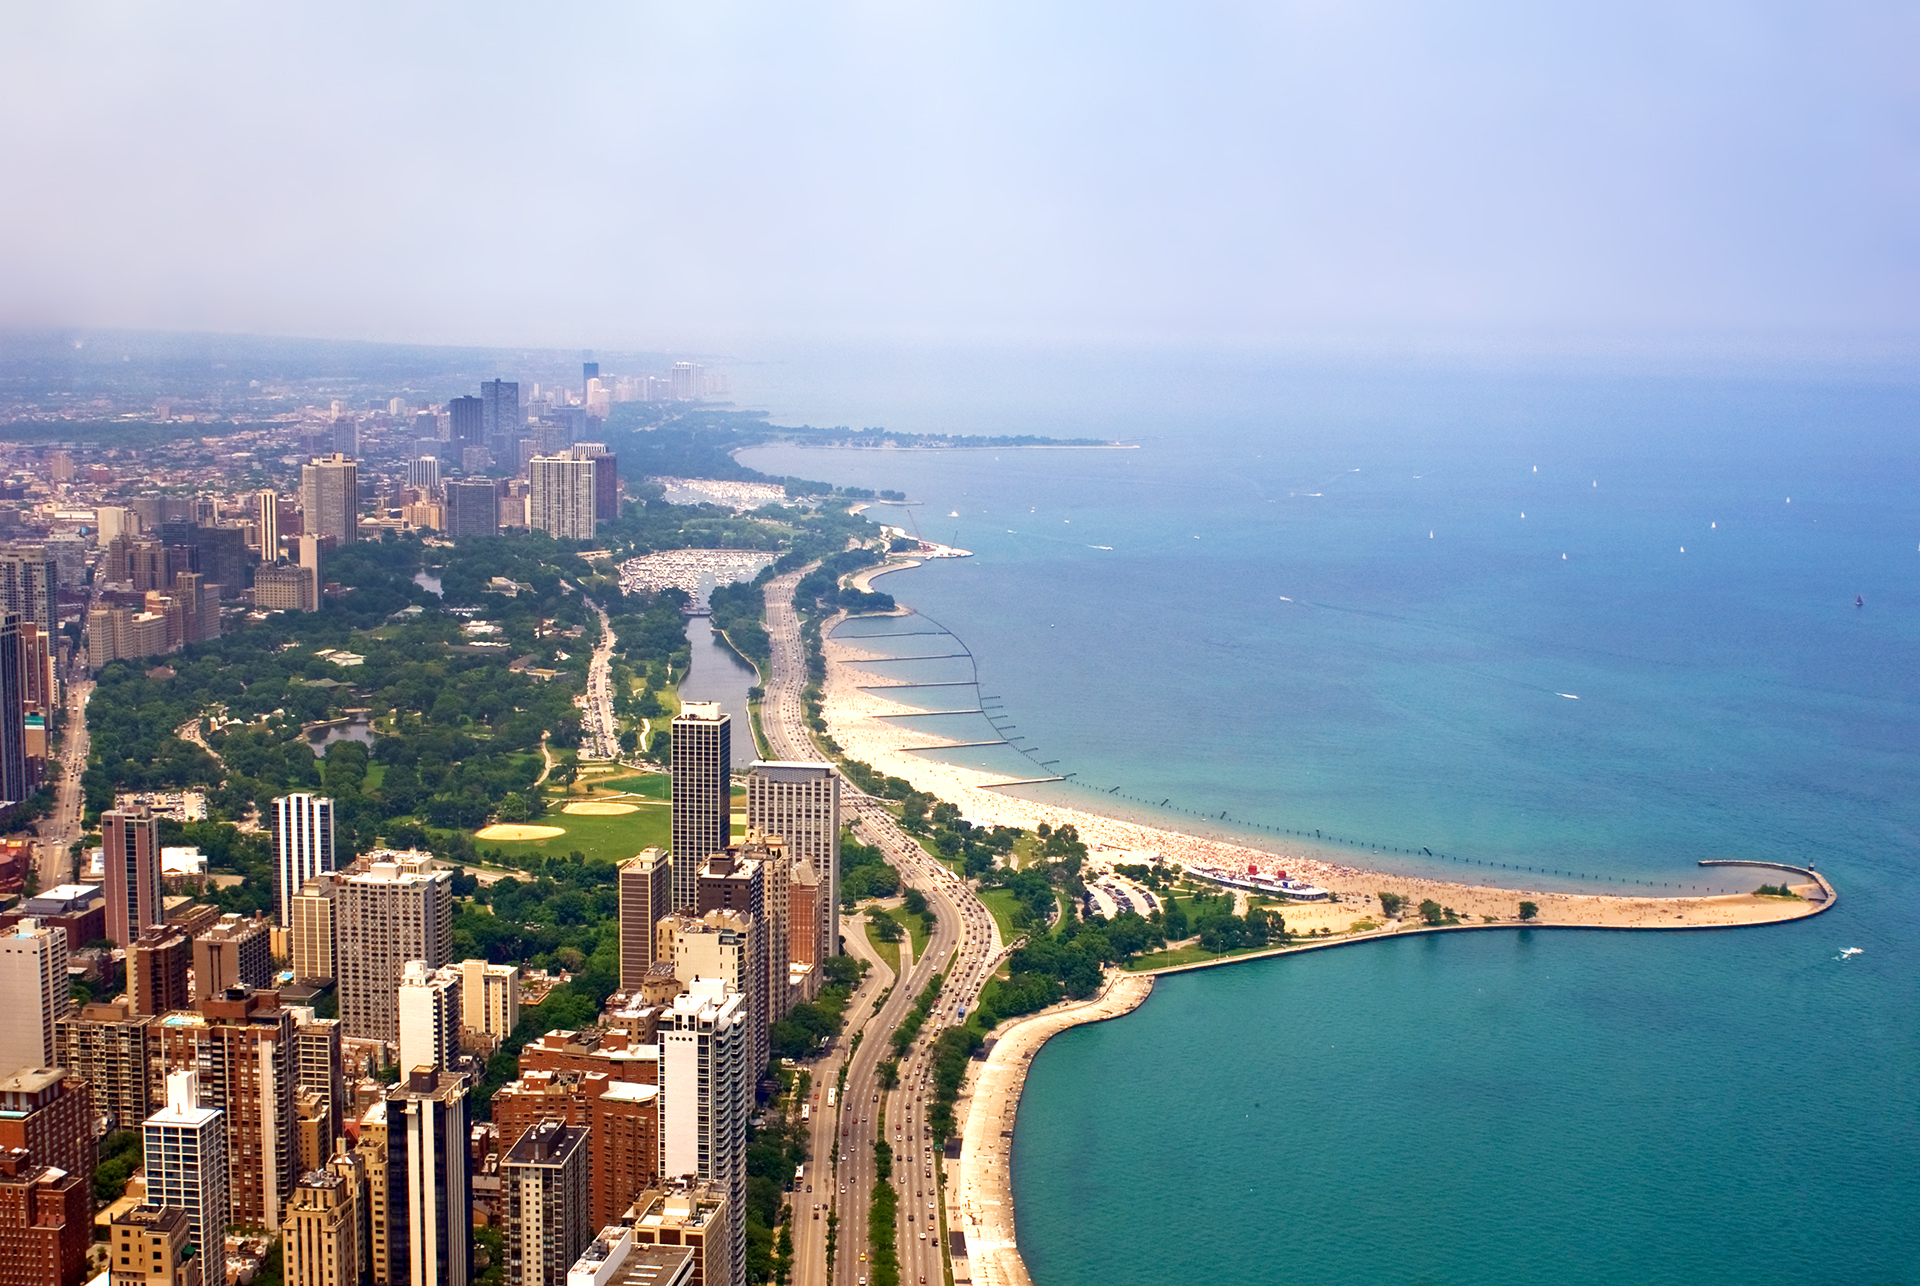 (c) 2017 Right Half Media - Chicago, Illinois, USA Photograph #1